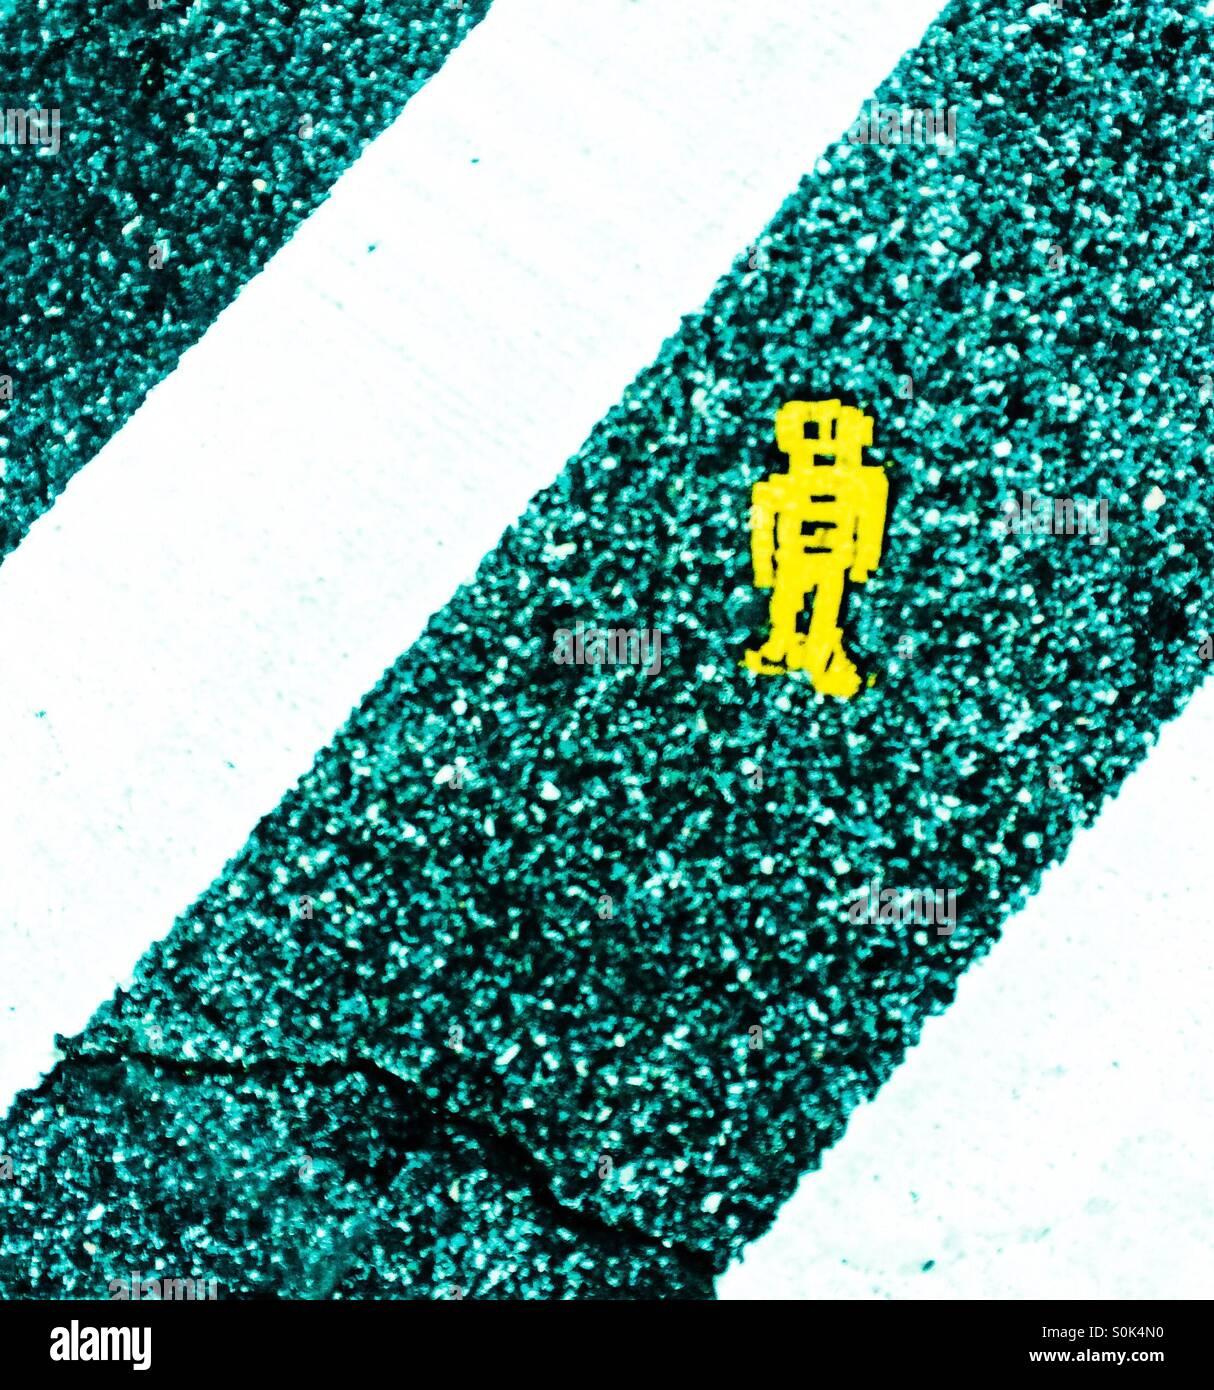 An alien on the sreet - Stock Image